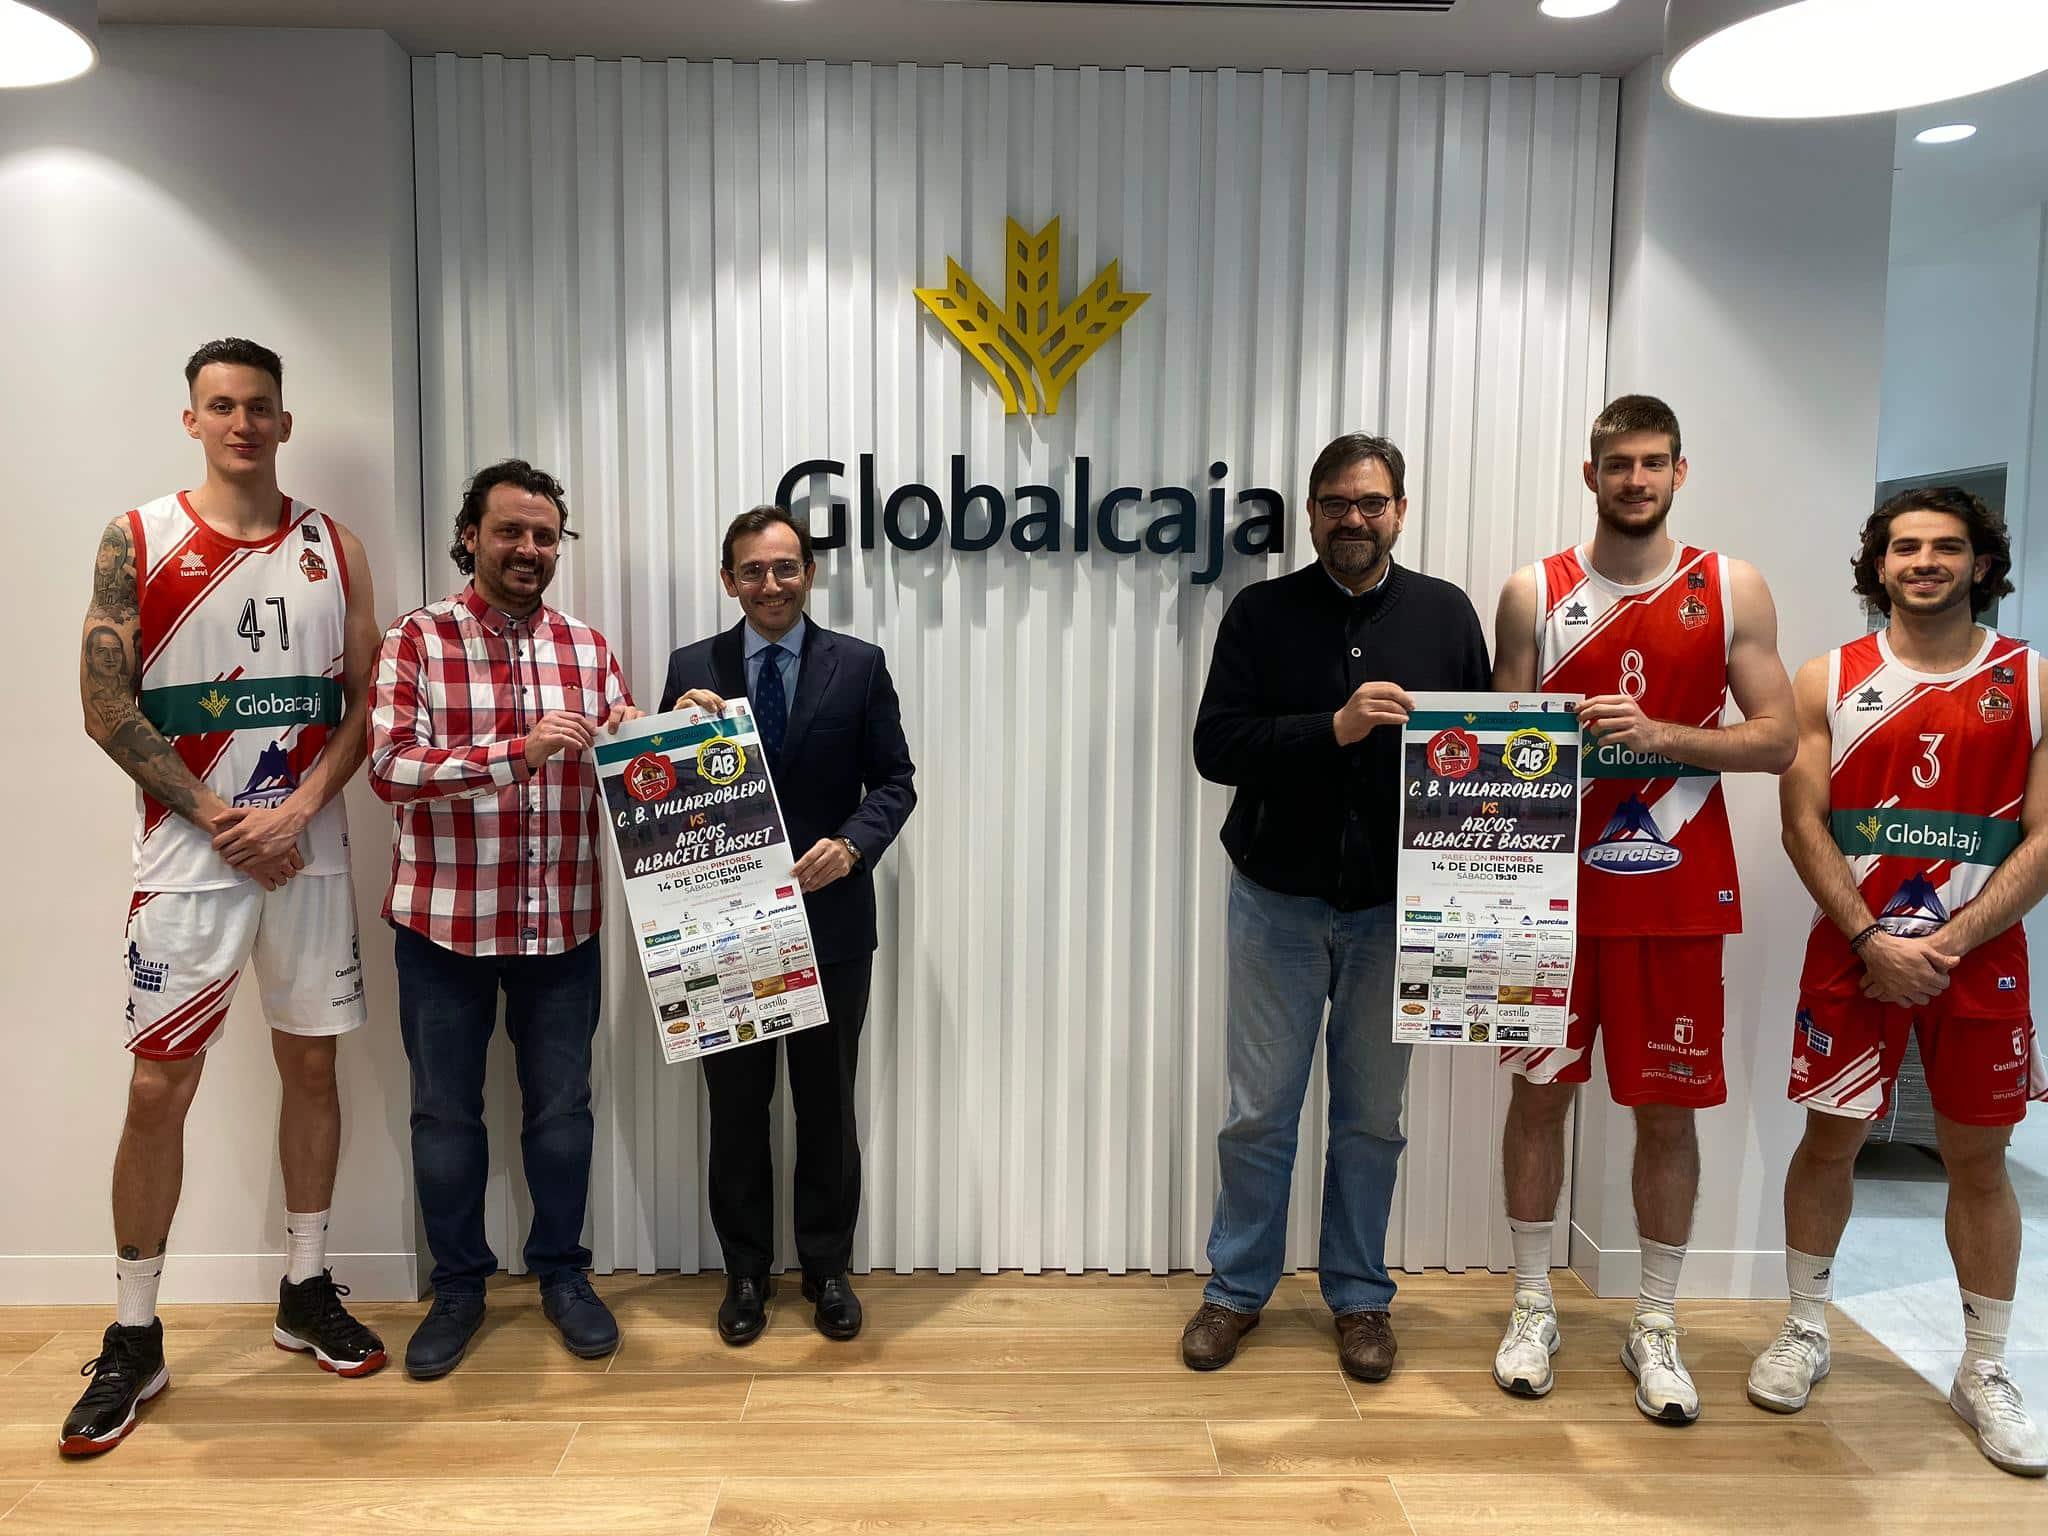 https://blog.globalcaja.es/wp-content/uploads/2019/12/Globalcaja-apoya-al-basket-Villarrobledo.jpg